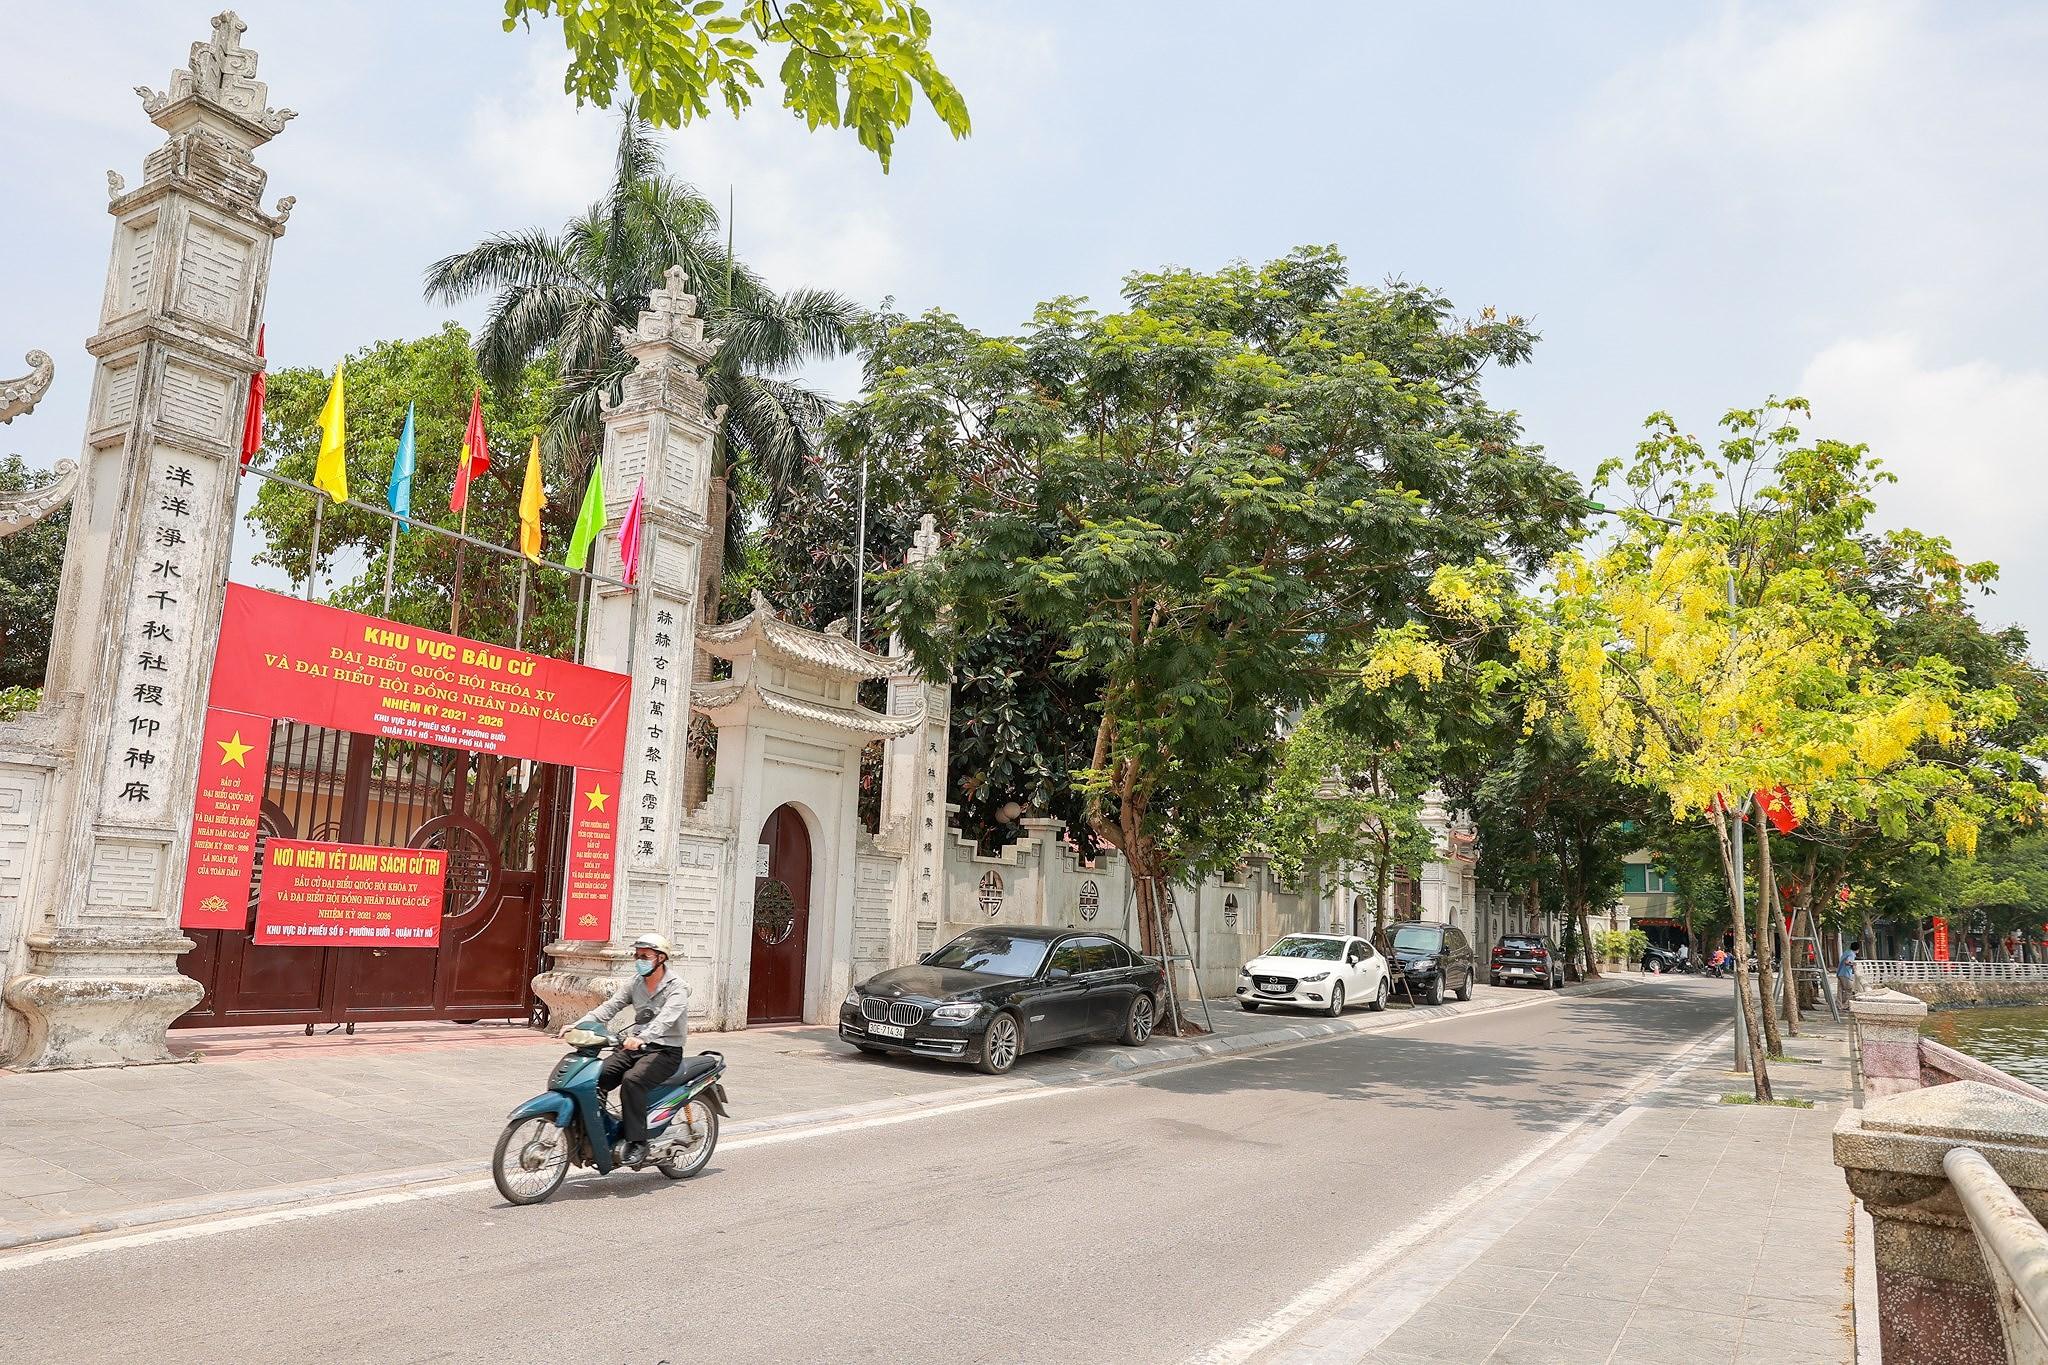 Pho phuong Ha Noi ruc ro co hoa chao don ngay hoi trong dai toan quoc hinh anh 20